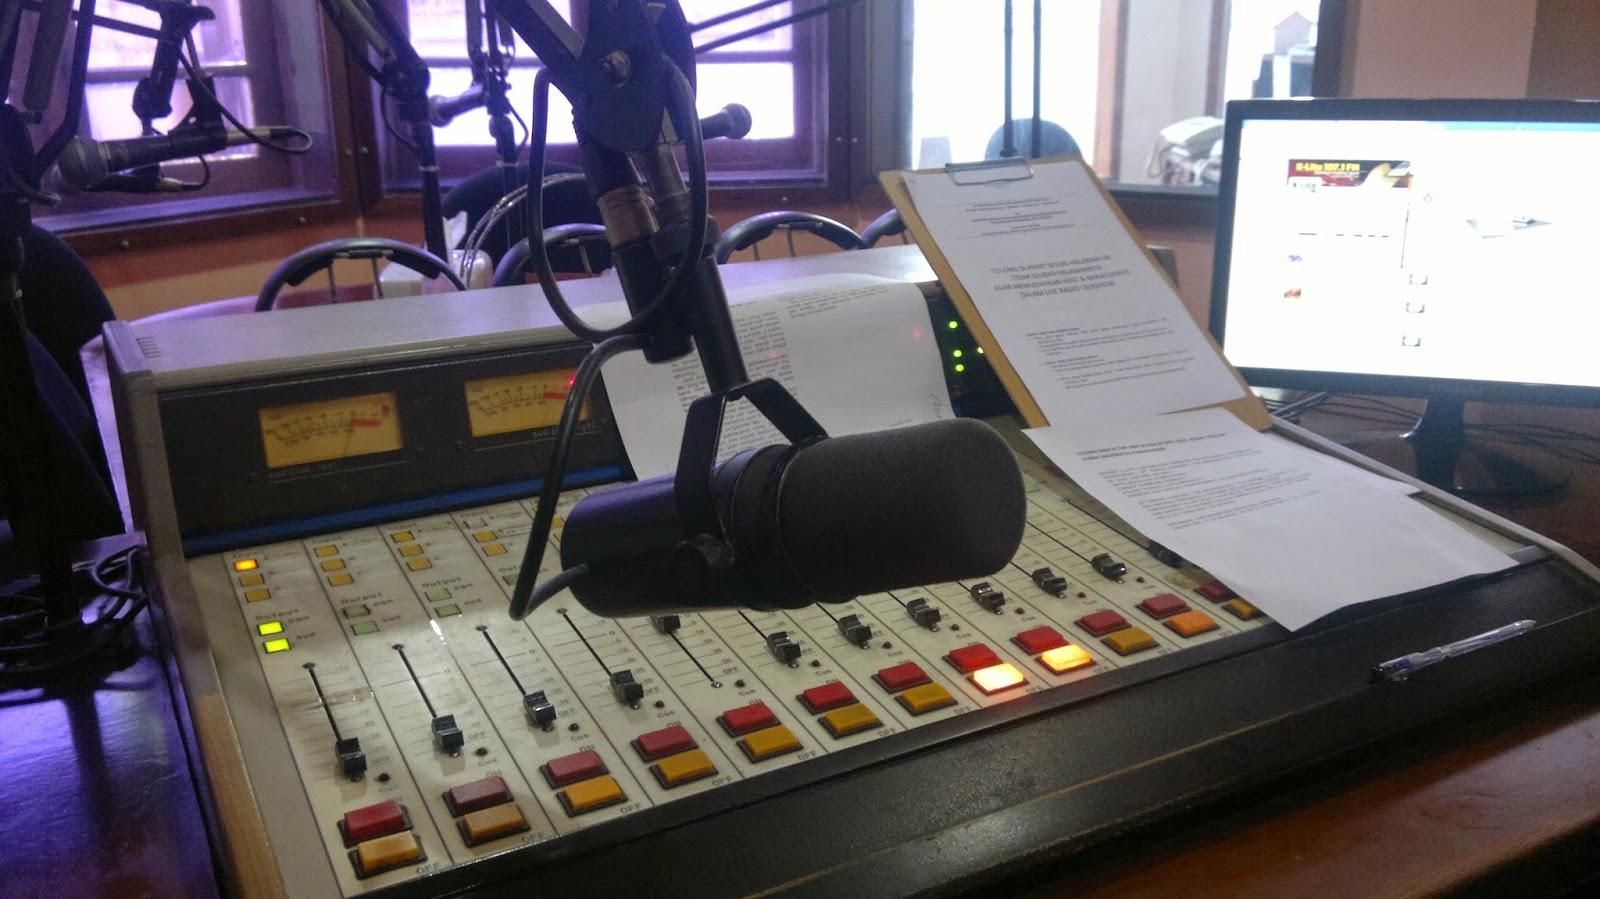 sofa studio musik bandung genuine leather manufacturers in china radio branding materials on air 107 1 k lite fm